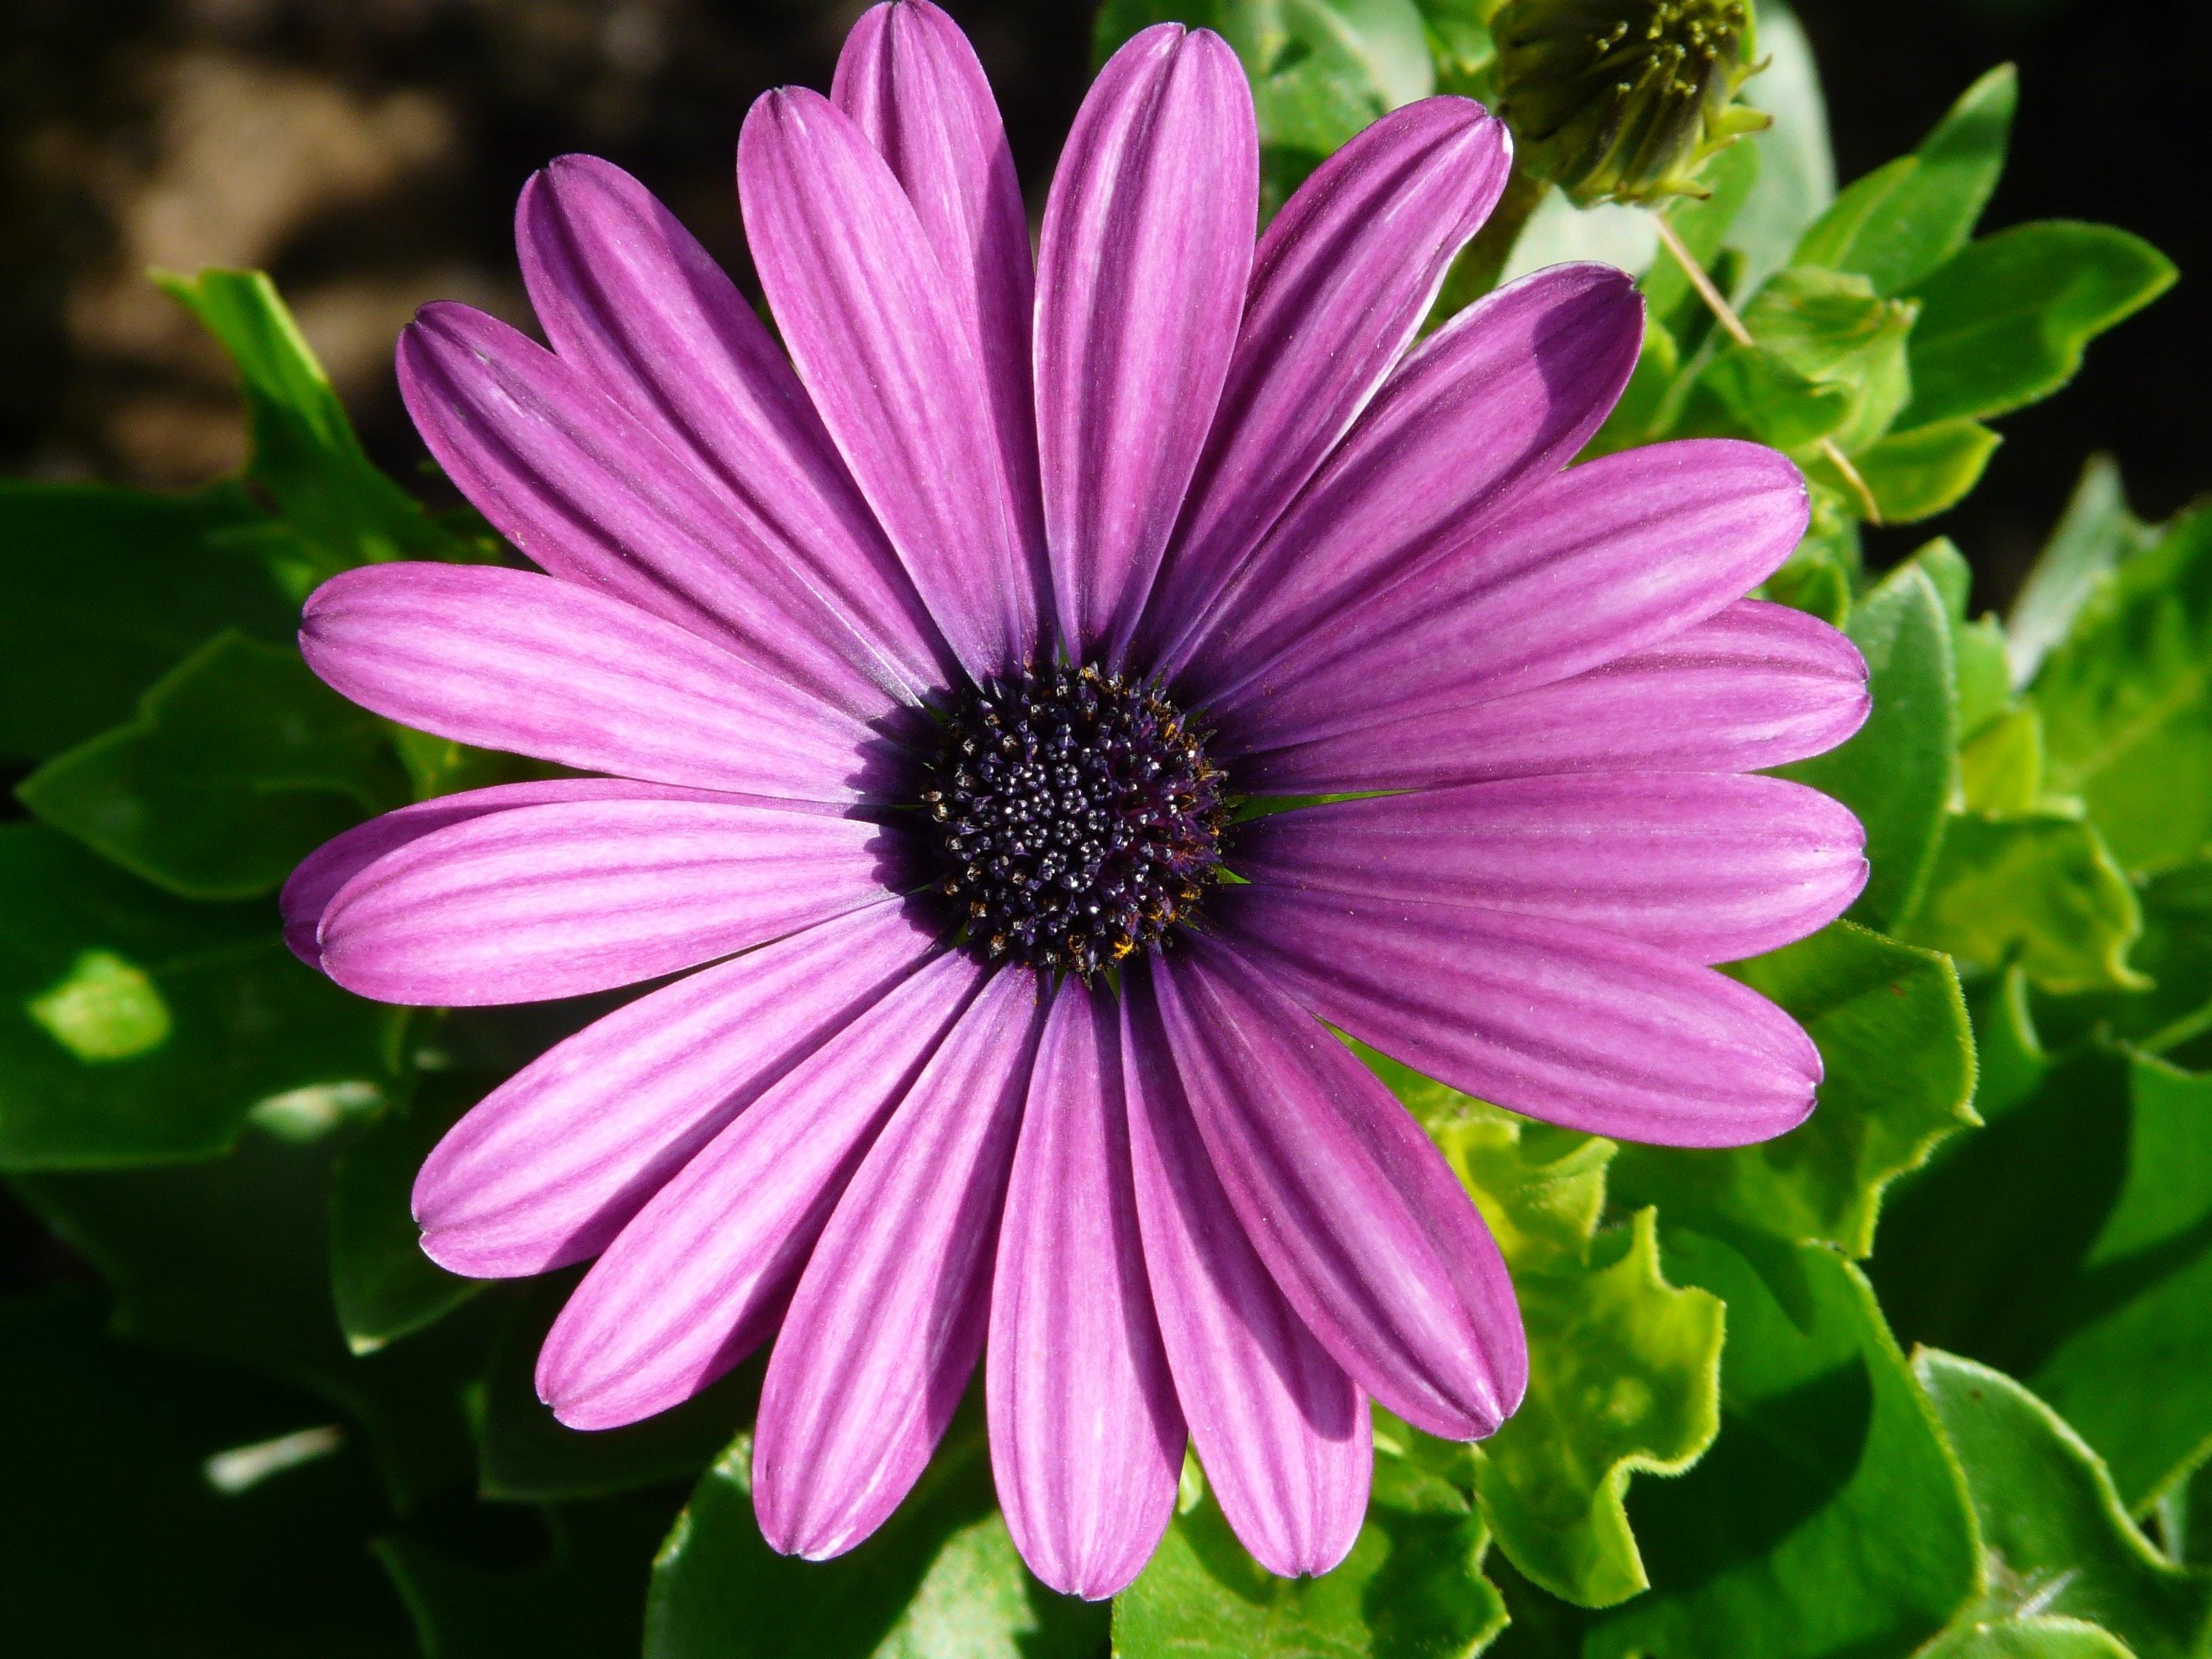 Purple Flower, Bloom, Blossom, Close-up, Daisy, HQ Photo